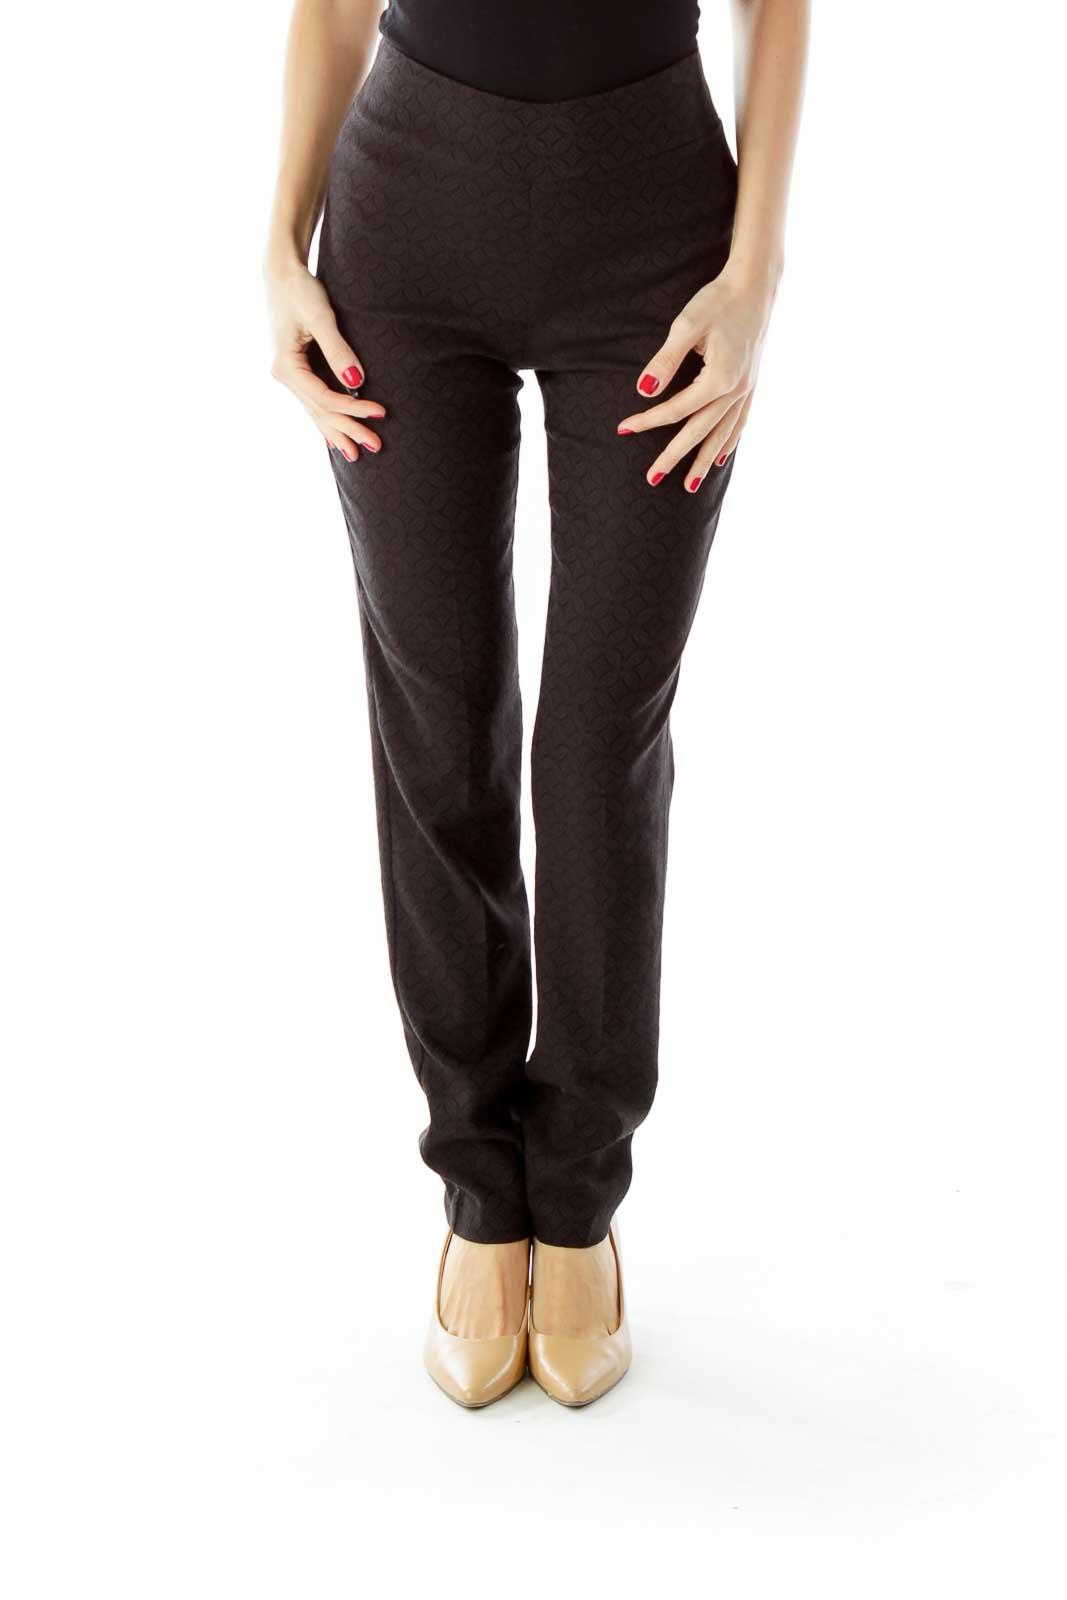 Black Textured Leggings Front